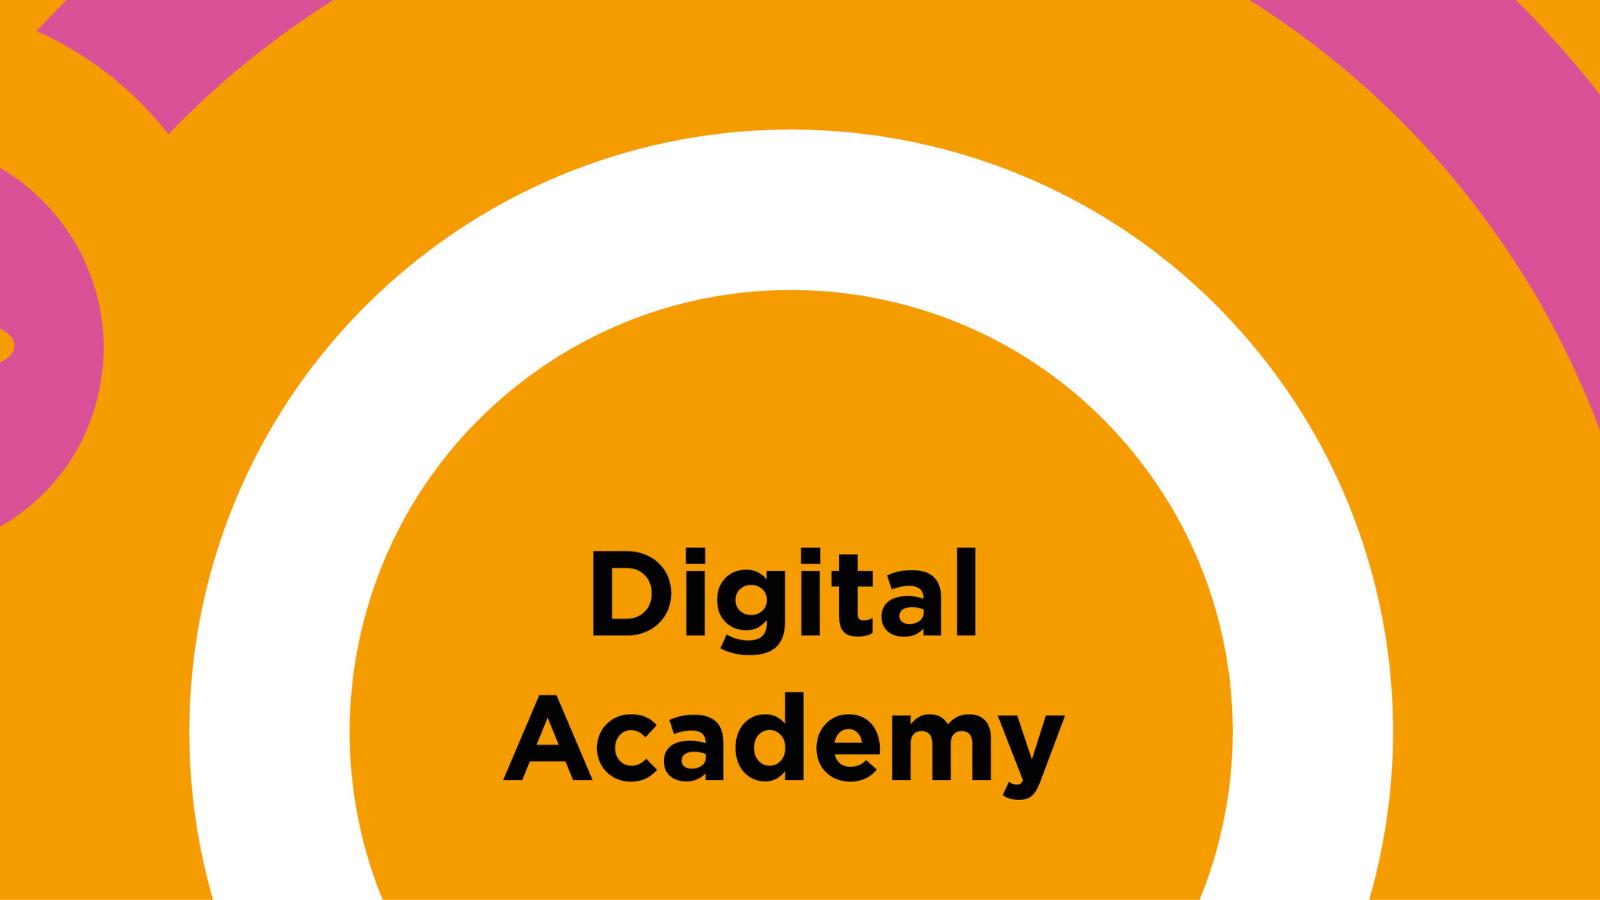 Digital Academy